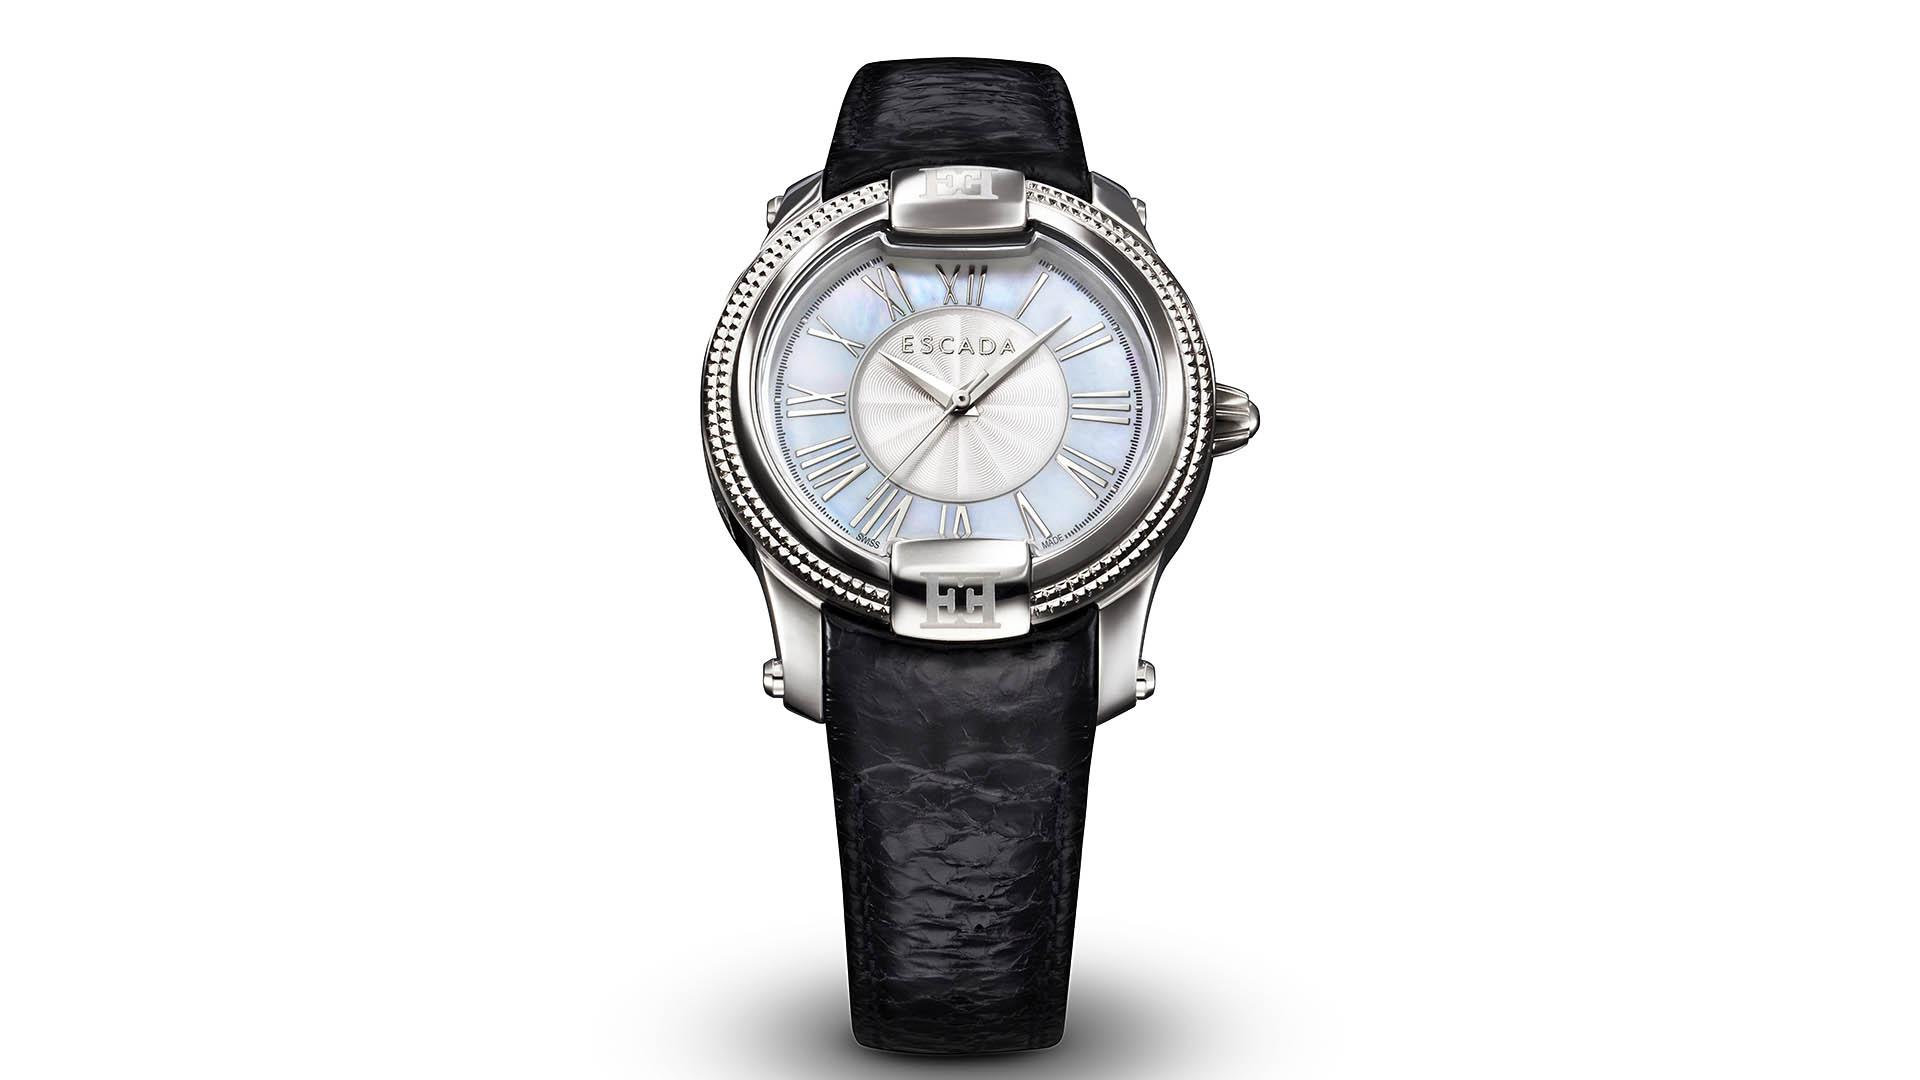 Imagephoto for Escada watches. Watchphoto taken for salesfolder. Watch photographer Christian Eppelt copyright 2015